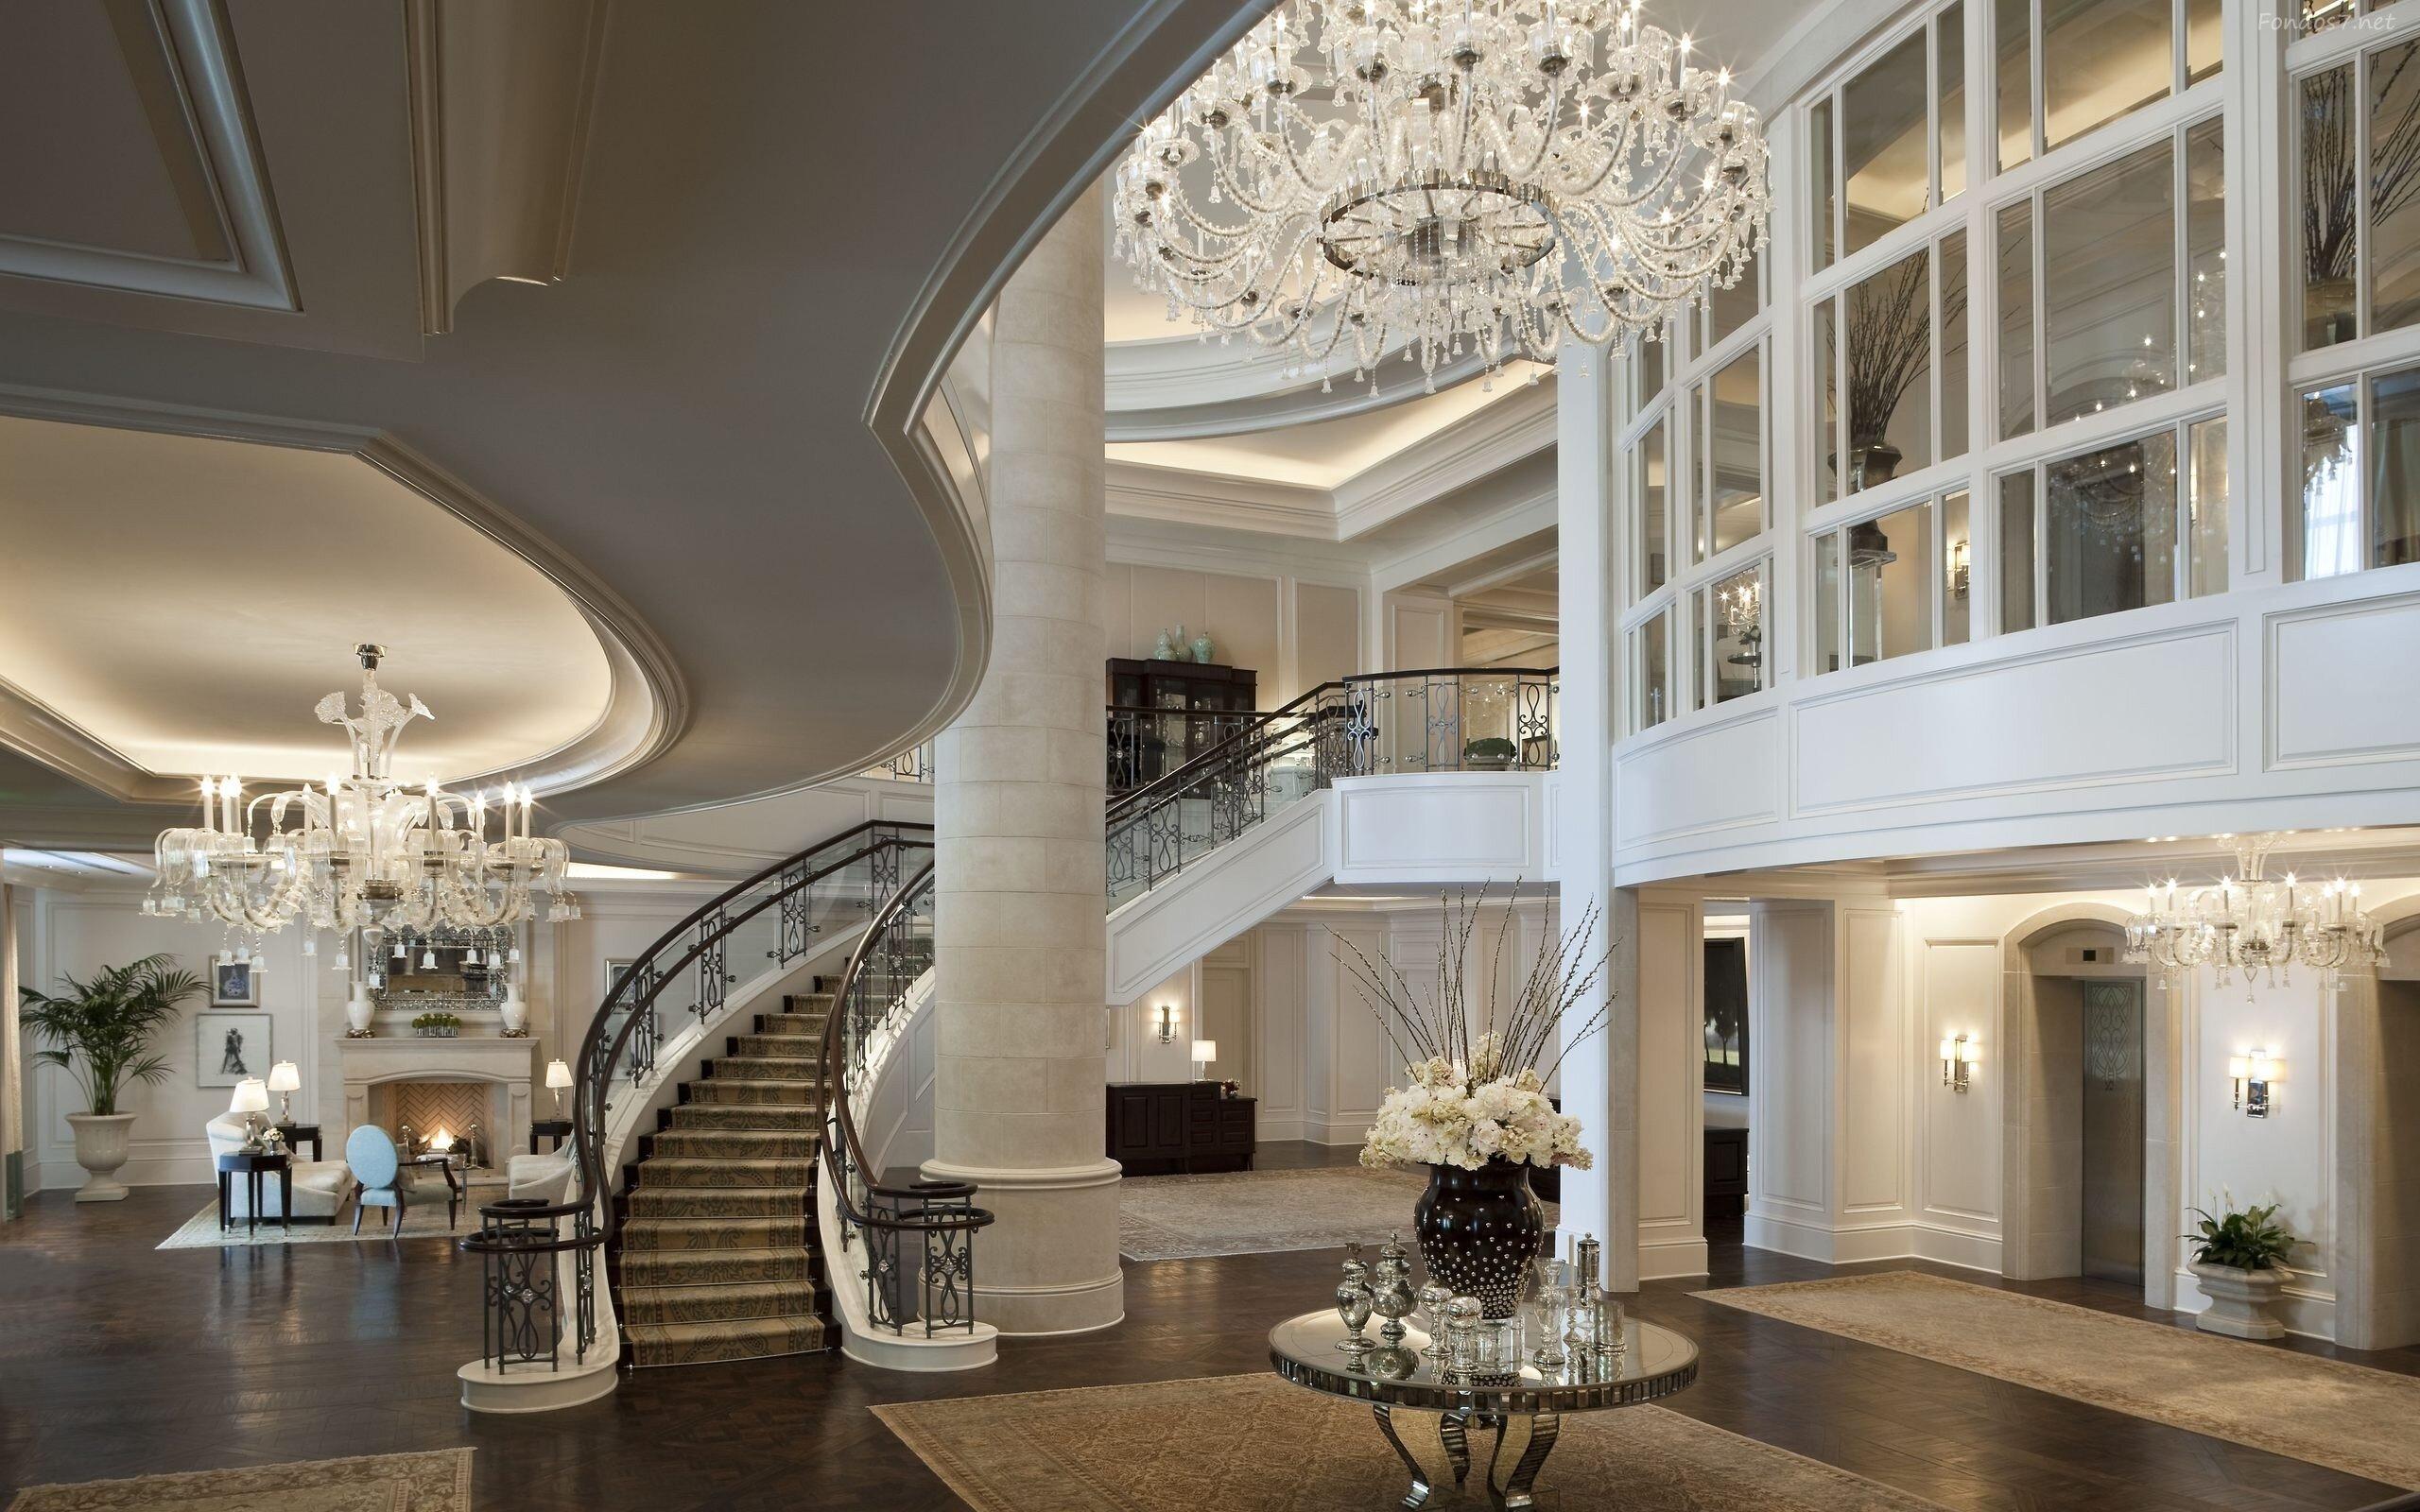 Luxury Interior Top 21 Luxury Interior Design Examples  Mostbeautifulthings